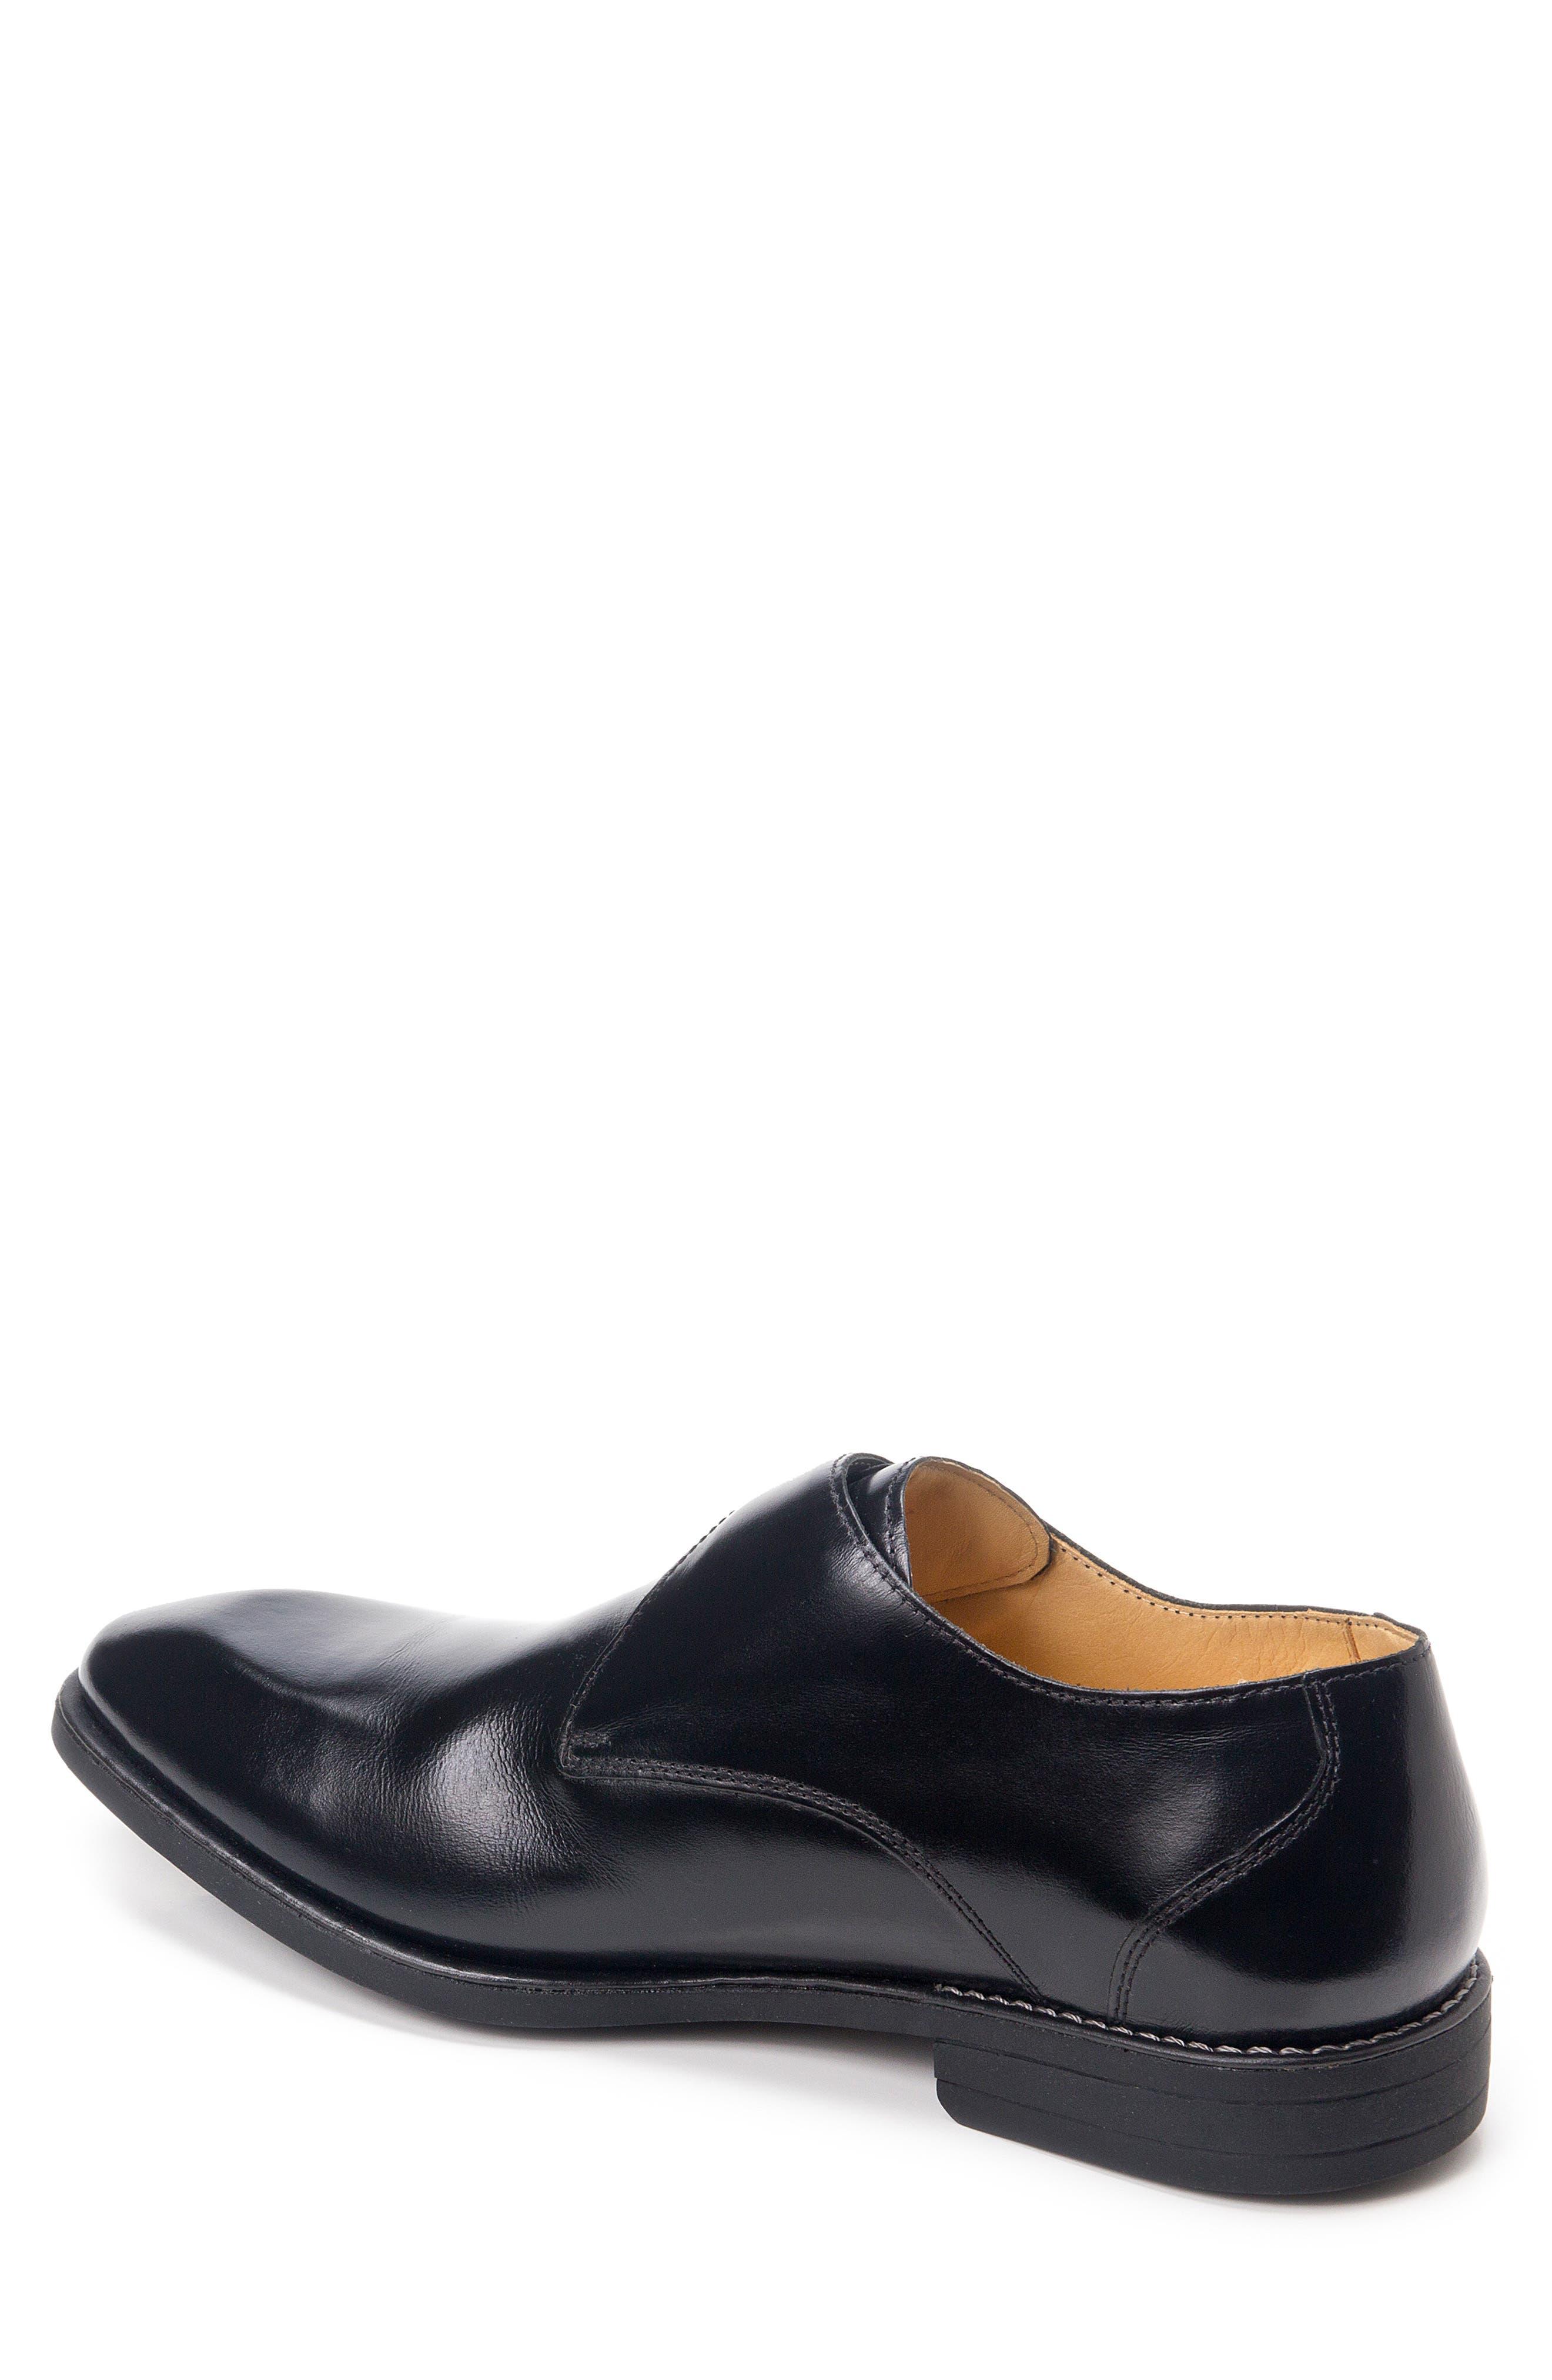 Wendell Single Buckle Monk Shoe,                             Alternate thumbnail 2, color,                             BLACK LEATHER